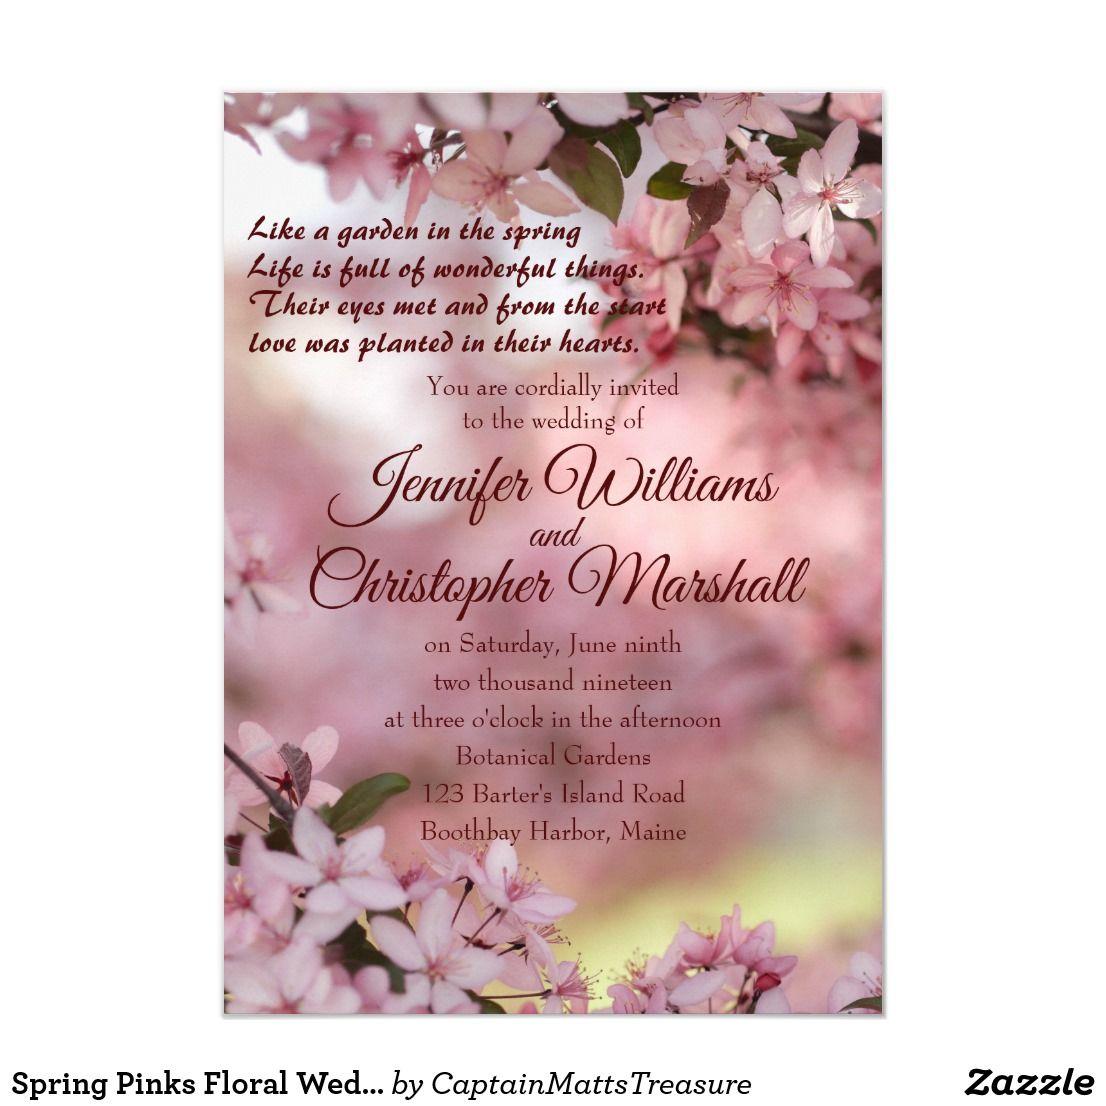 Spring Pinks Floral Wedding Invitation | Zazzle.com | Floral wedding  invitations, Fun wedding invitations, Wedding invitations